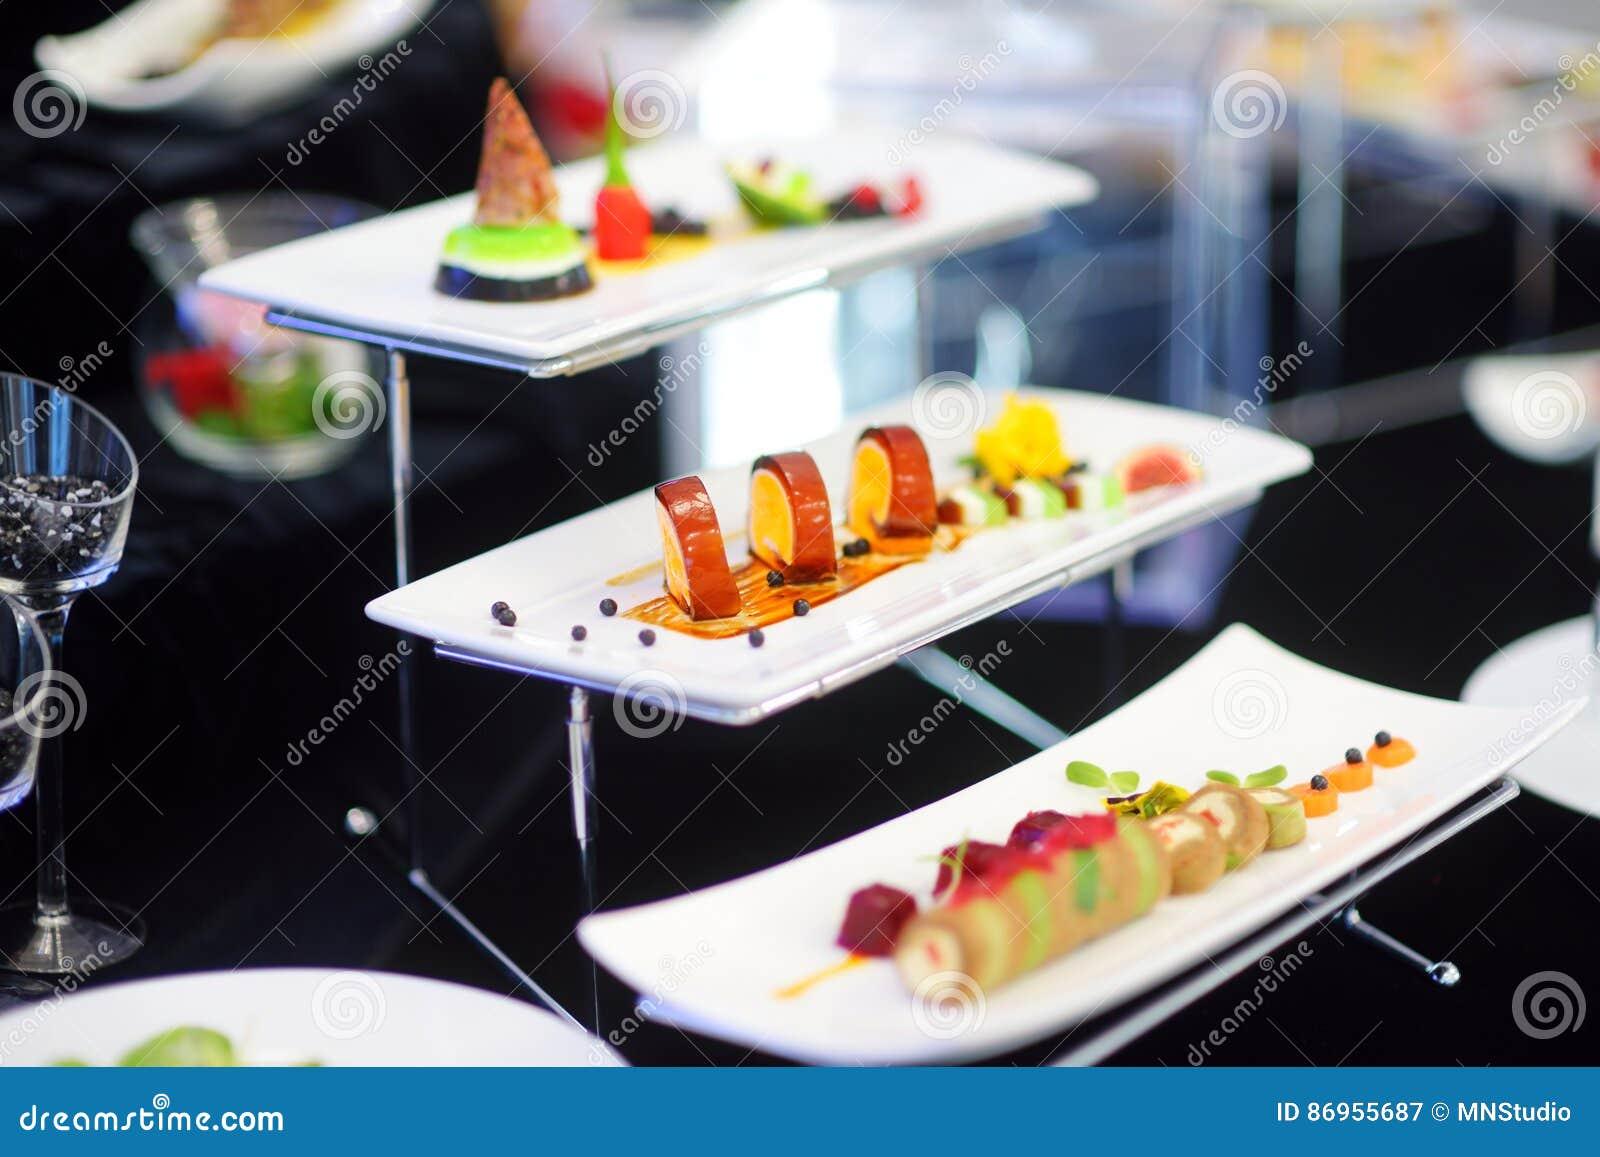 Genial platos de cocina moderna im genes diez platos for Platos de cocina